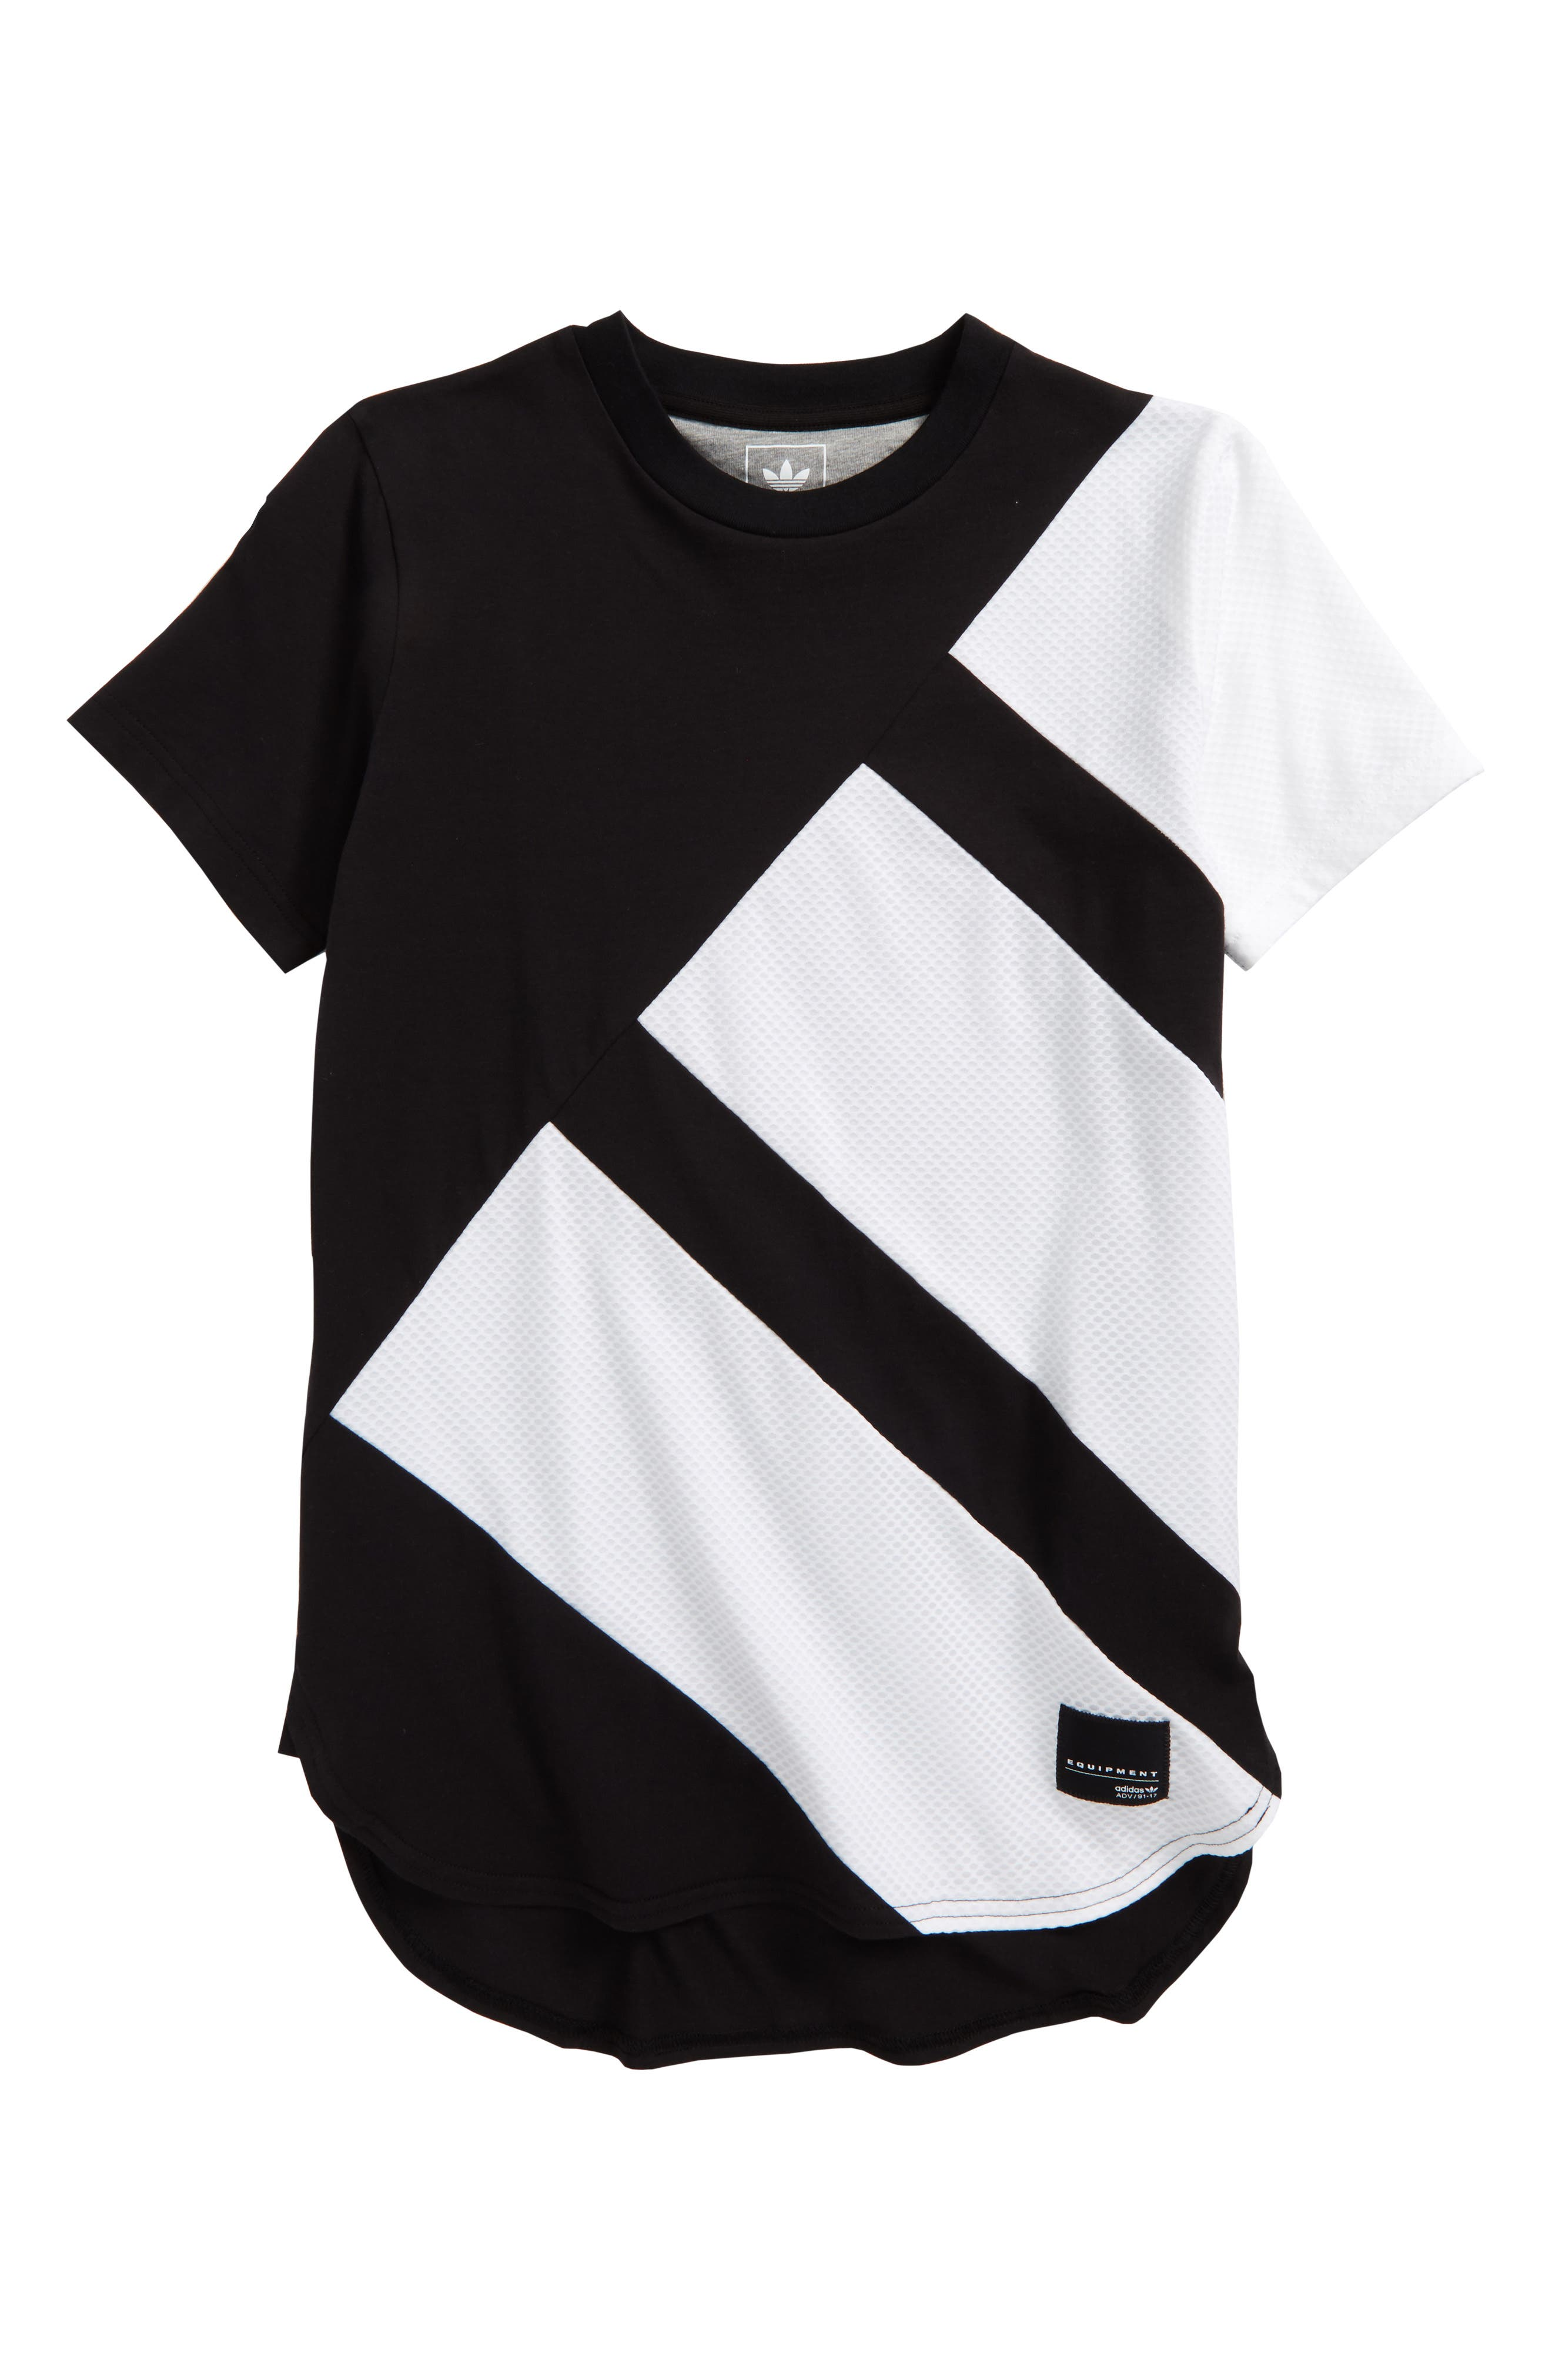 Main Image - adidas Originals EQT Elongated T-Shirt (Little Boys & Big Boys)